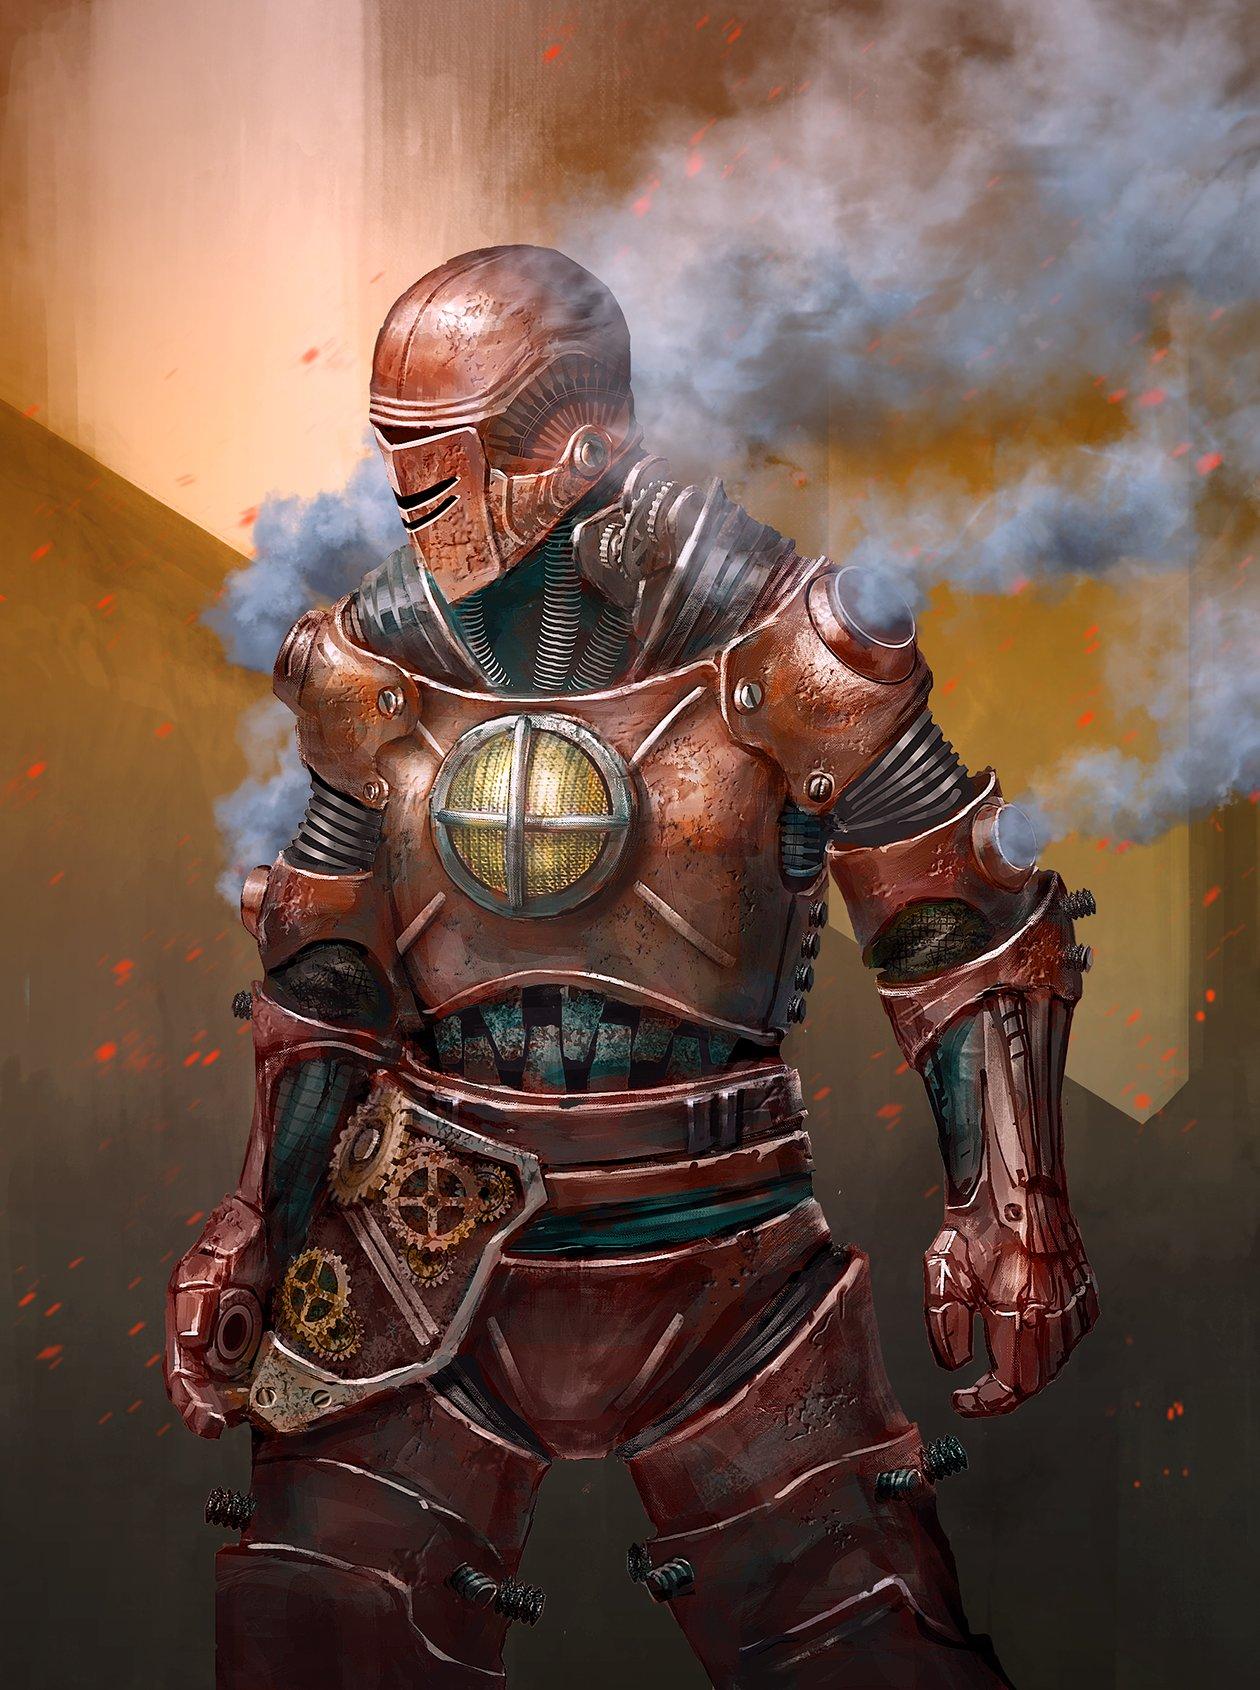 Steampunk Iron Man : steampunk, Steampunk, Thomas, Marvel